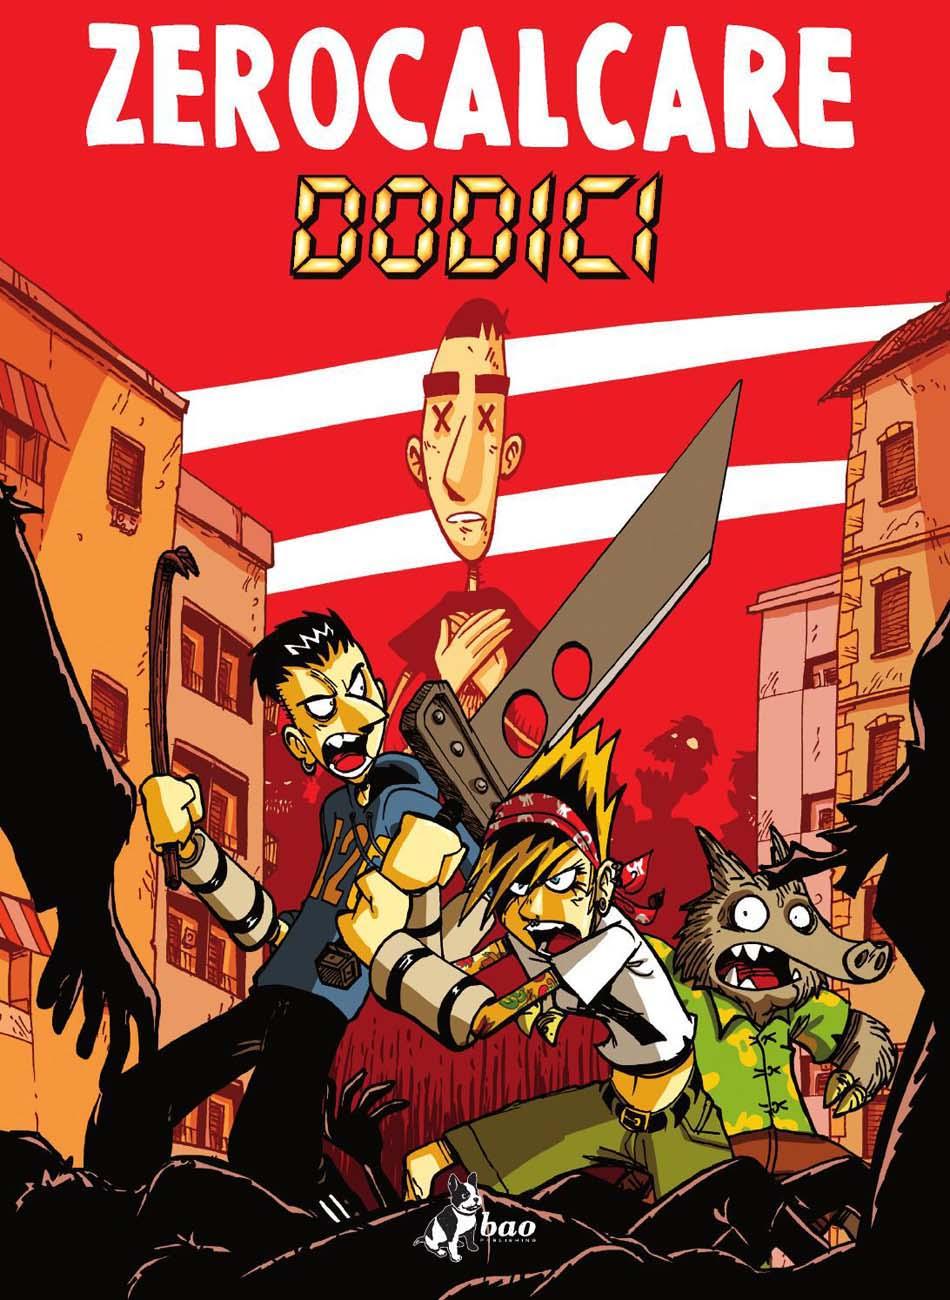 DODICI ZEROCALCARE BAO_00_COVER